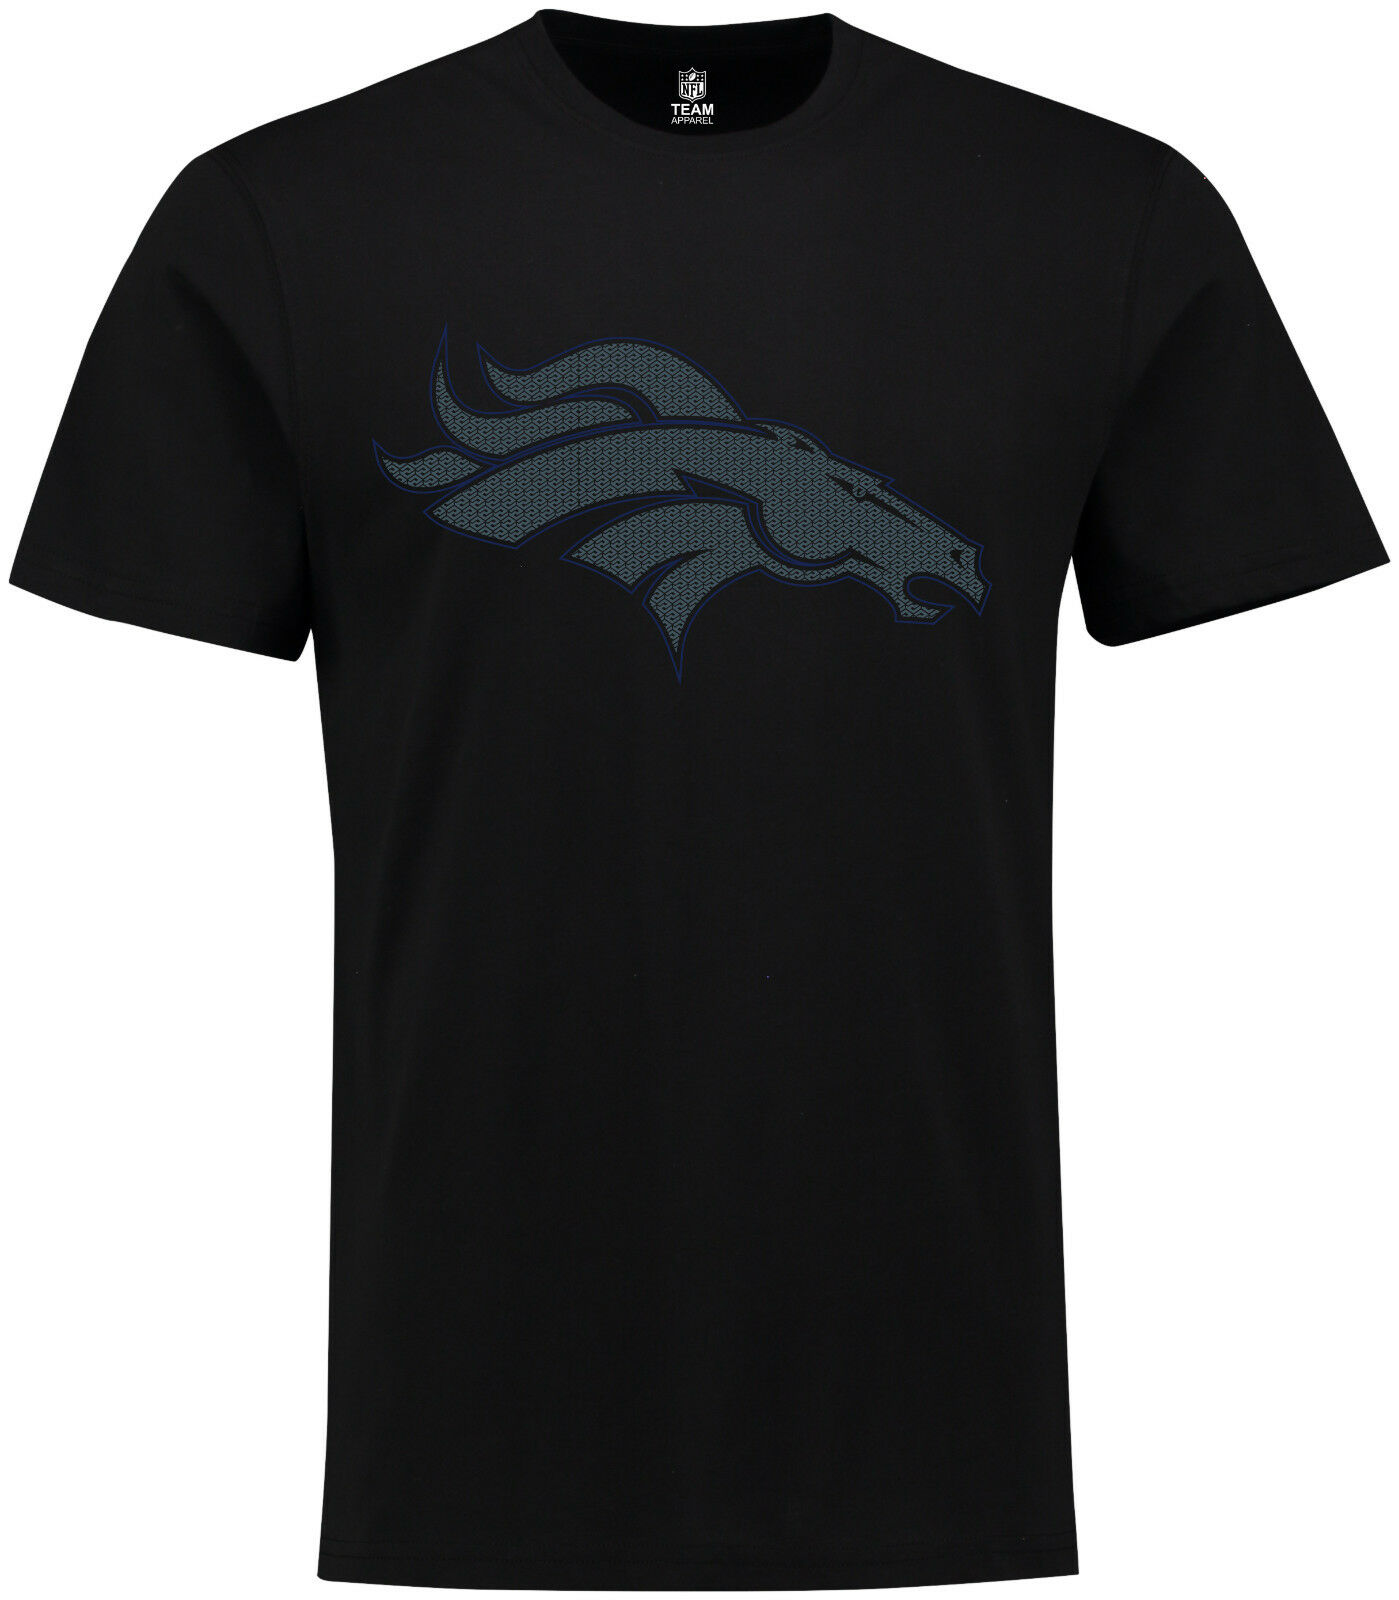 NFL Football T-Shirt T-Shirt T-Shirt Denver Broncos Tanser 2018 von Majestic neu schwarz 6ff3bd